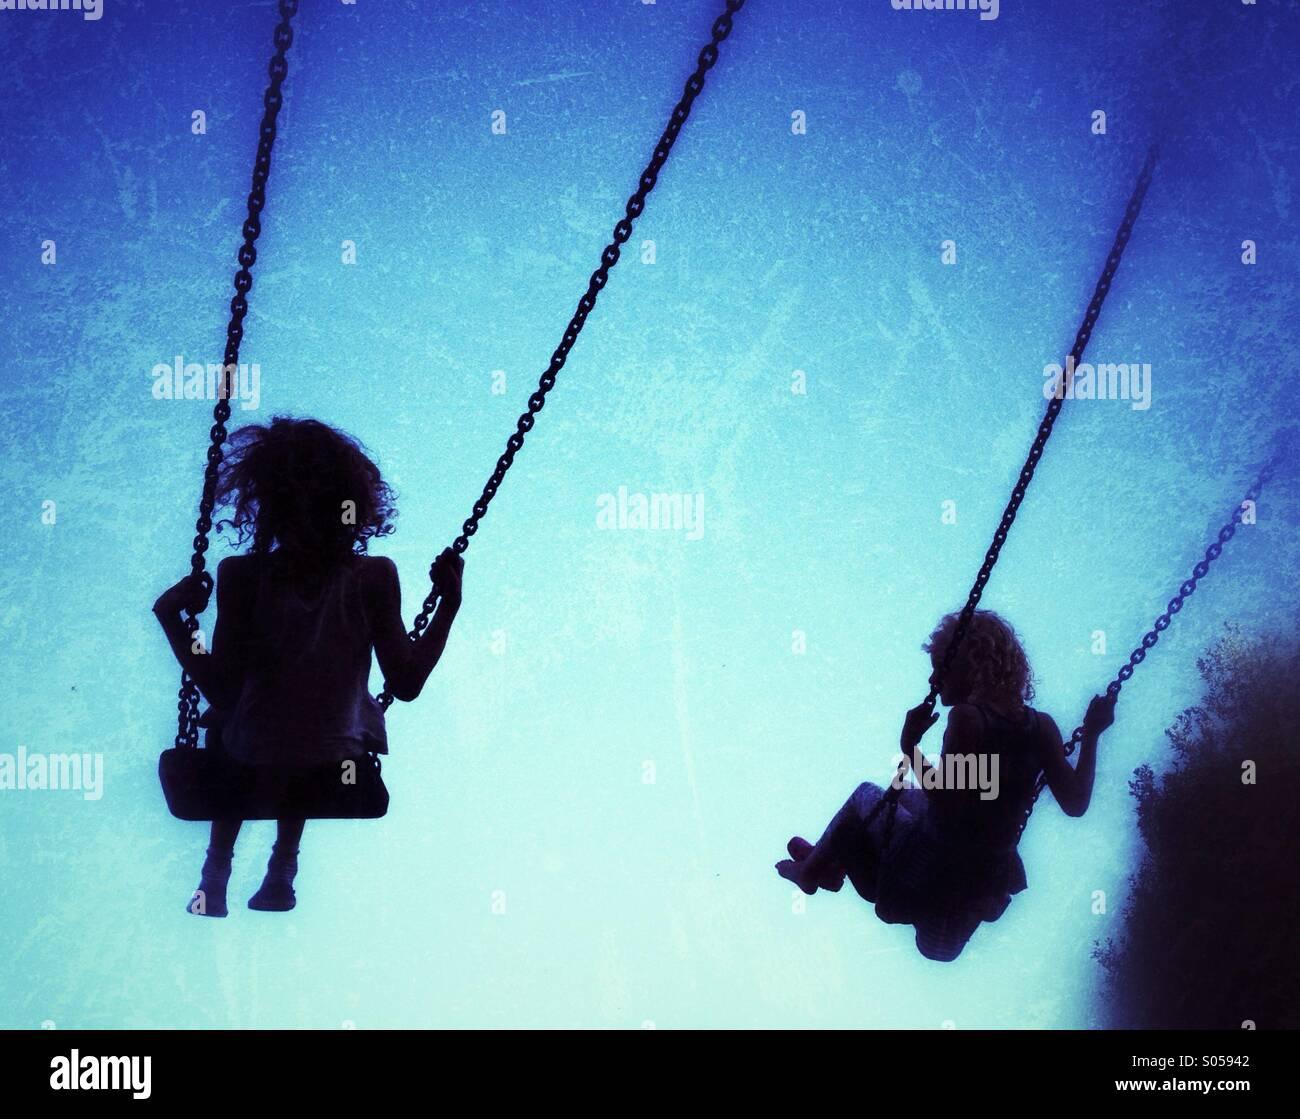 Dos chicas de columpios silueteado contra el cielo azul Imagen De Stock